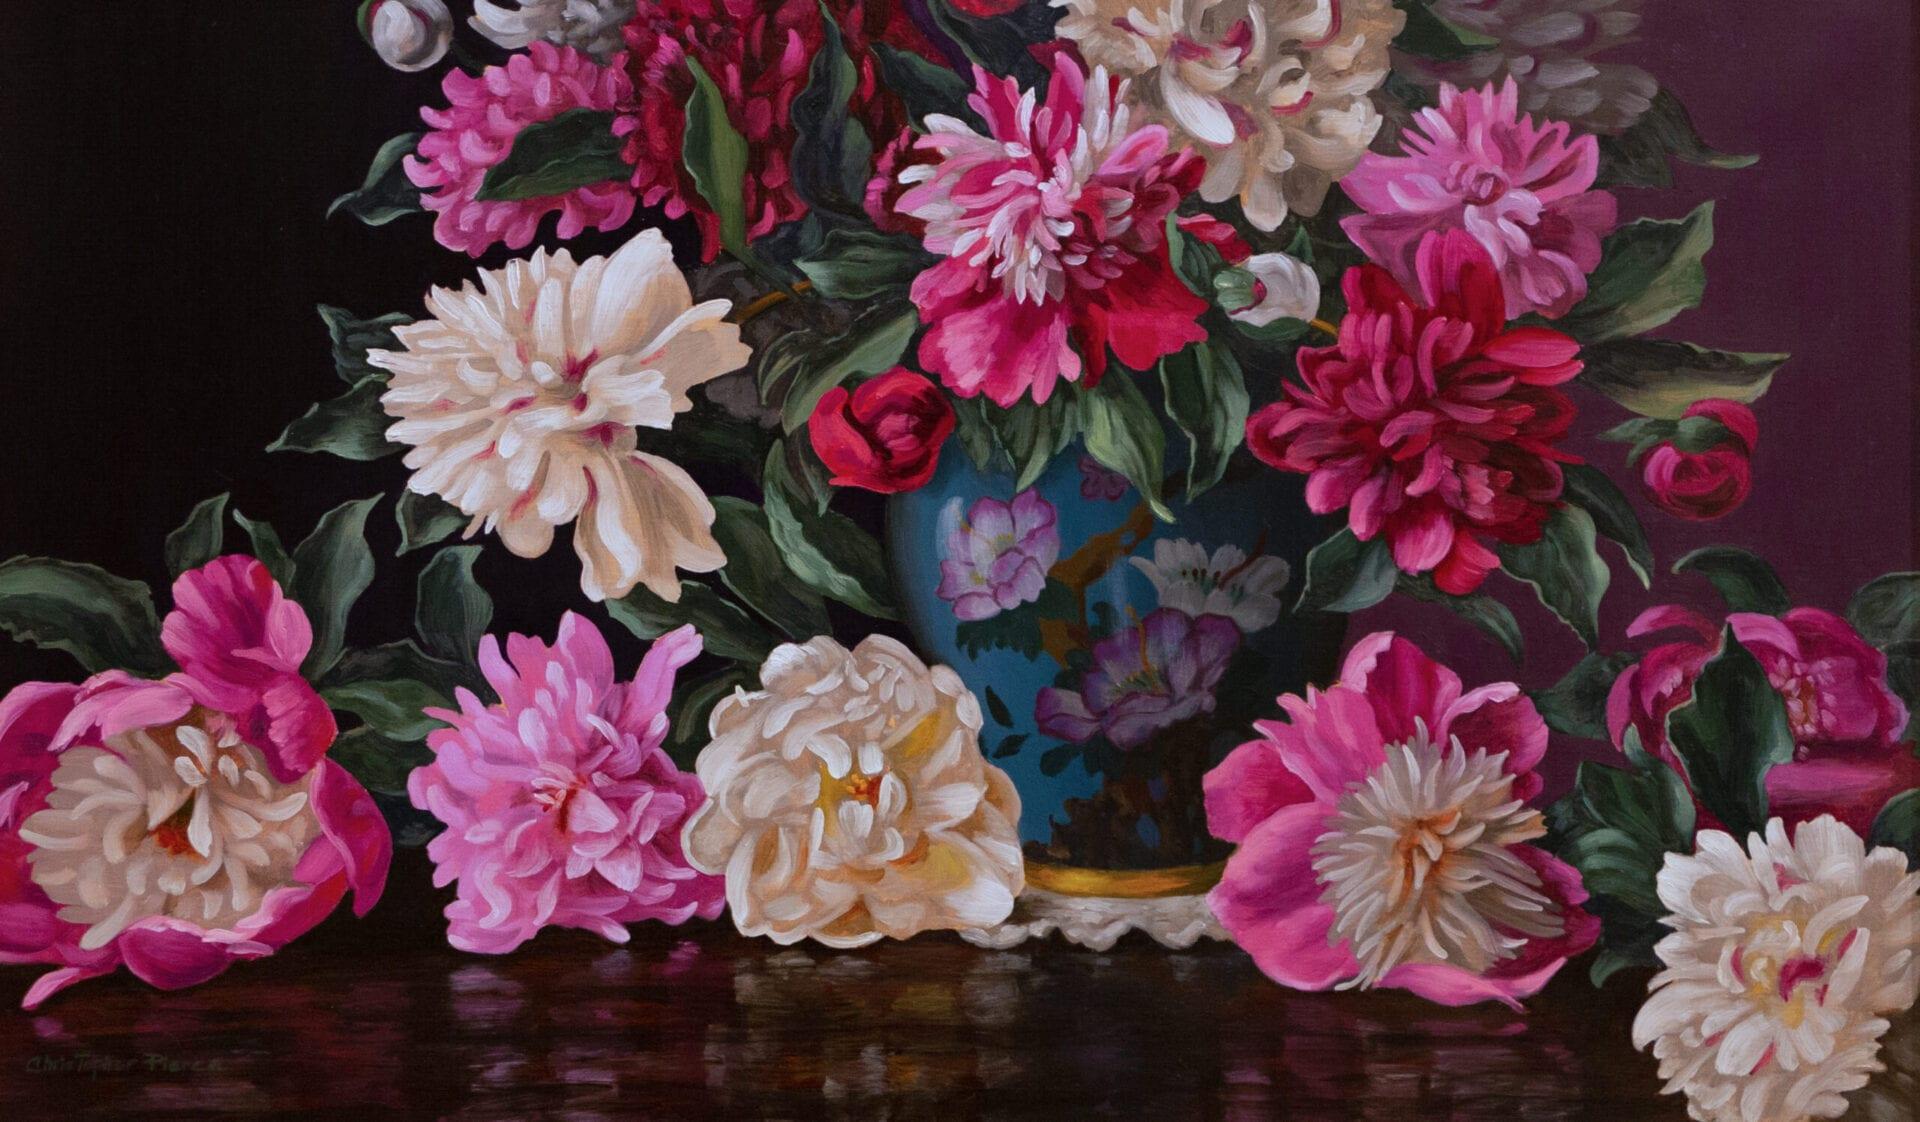 Christopher Pierce - Peonies in Chinese Blue Vase